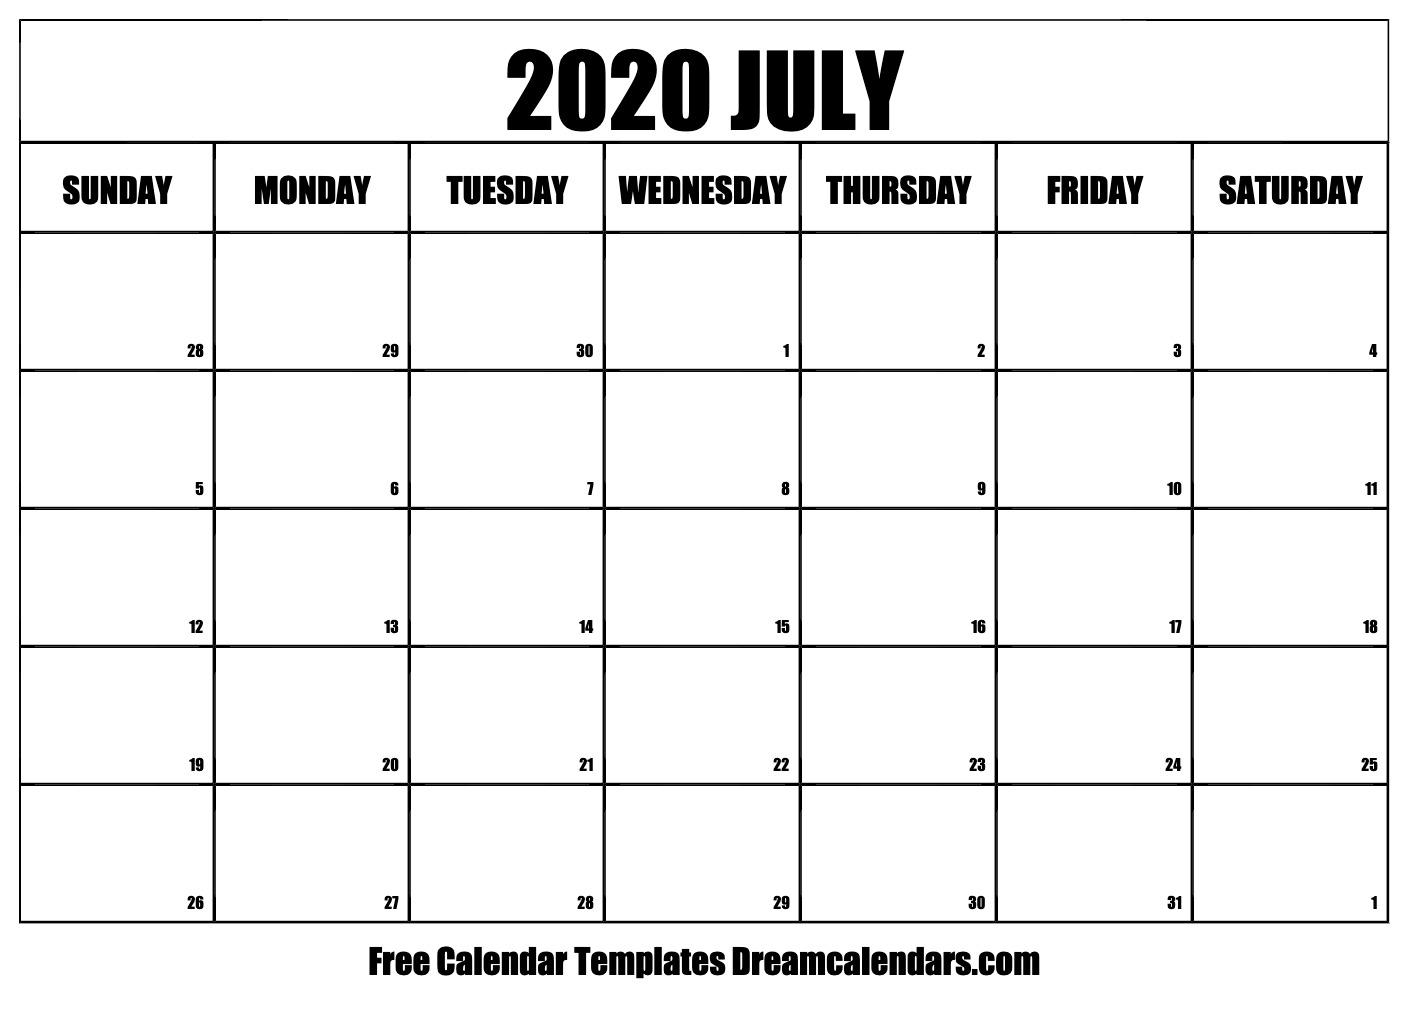 Free Blank July 2020 Printable Calendar intended for 2020 Printable Calendar - Sunday Thru Saturday